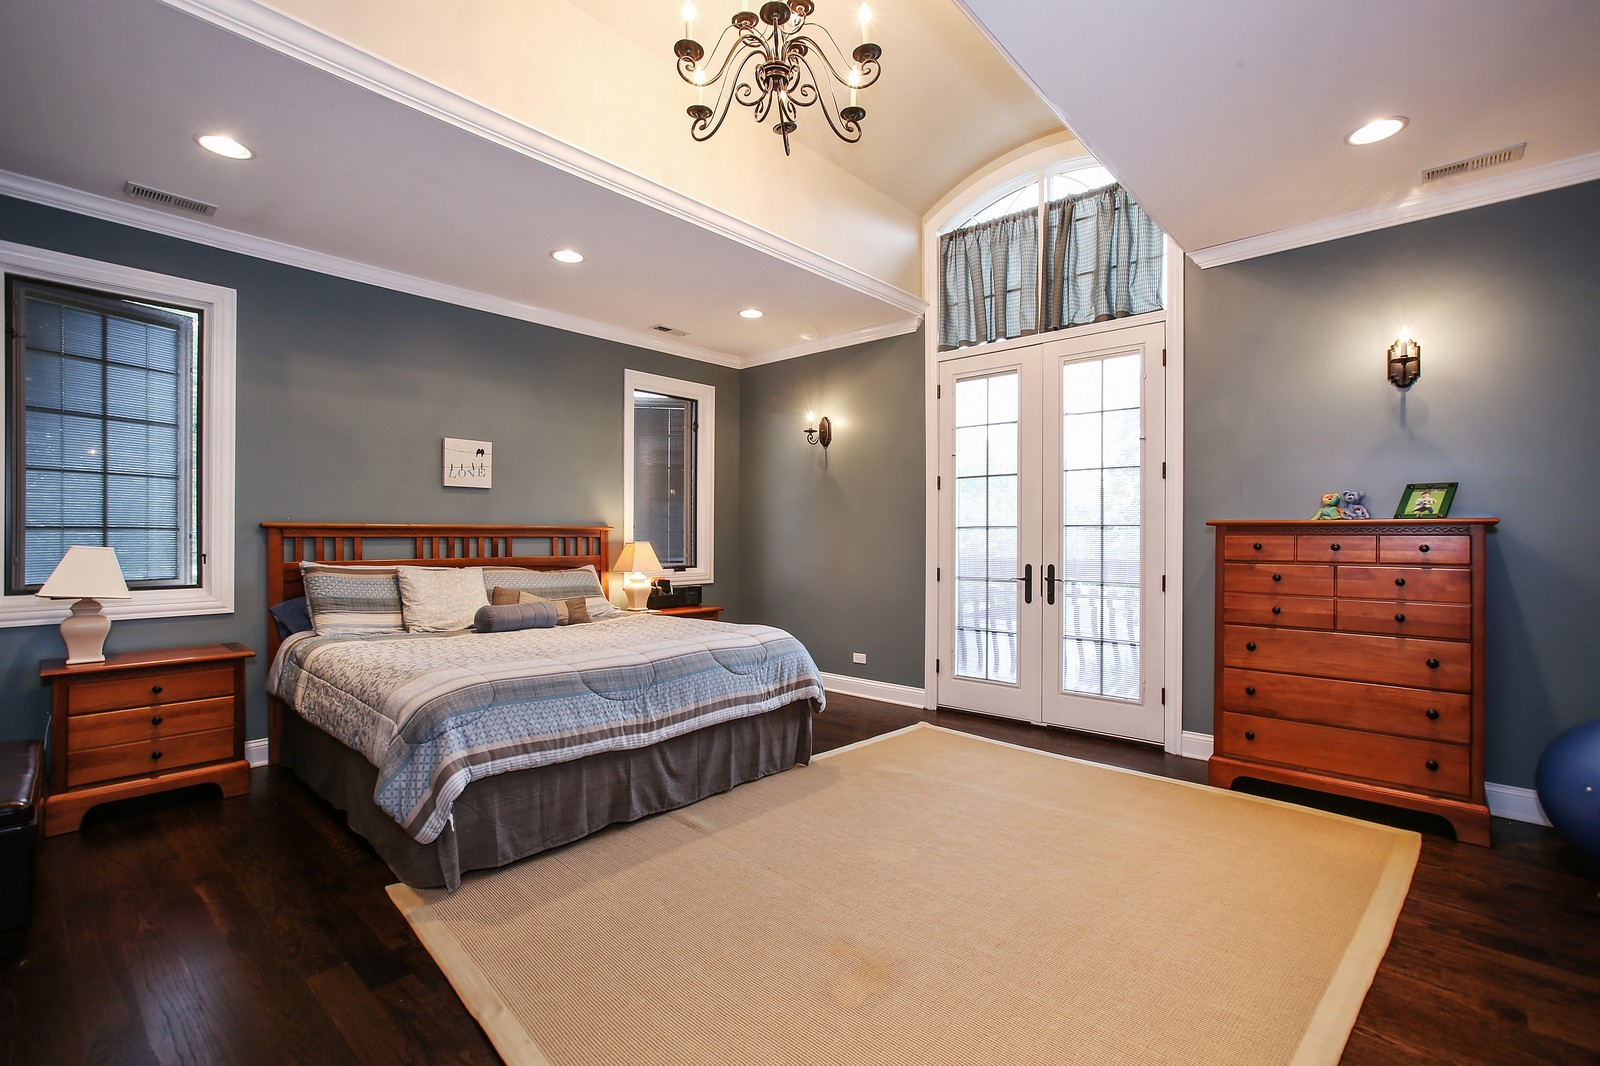 Real Estate Photography - 719 S Hillside Ave, Elmhurst, IL, 60126 - Master Bedroom